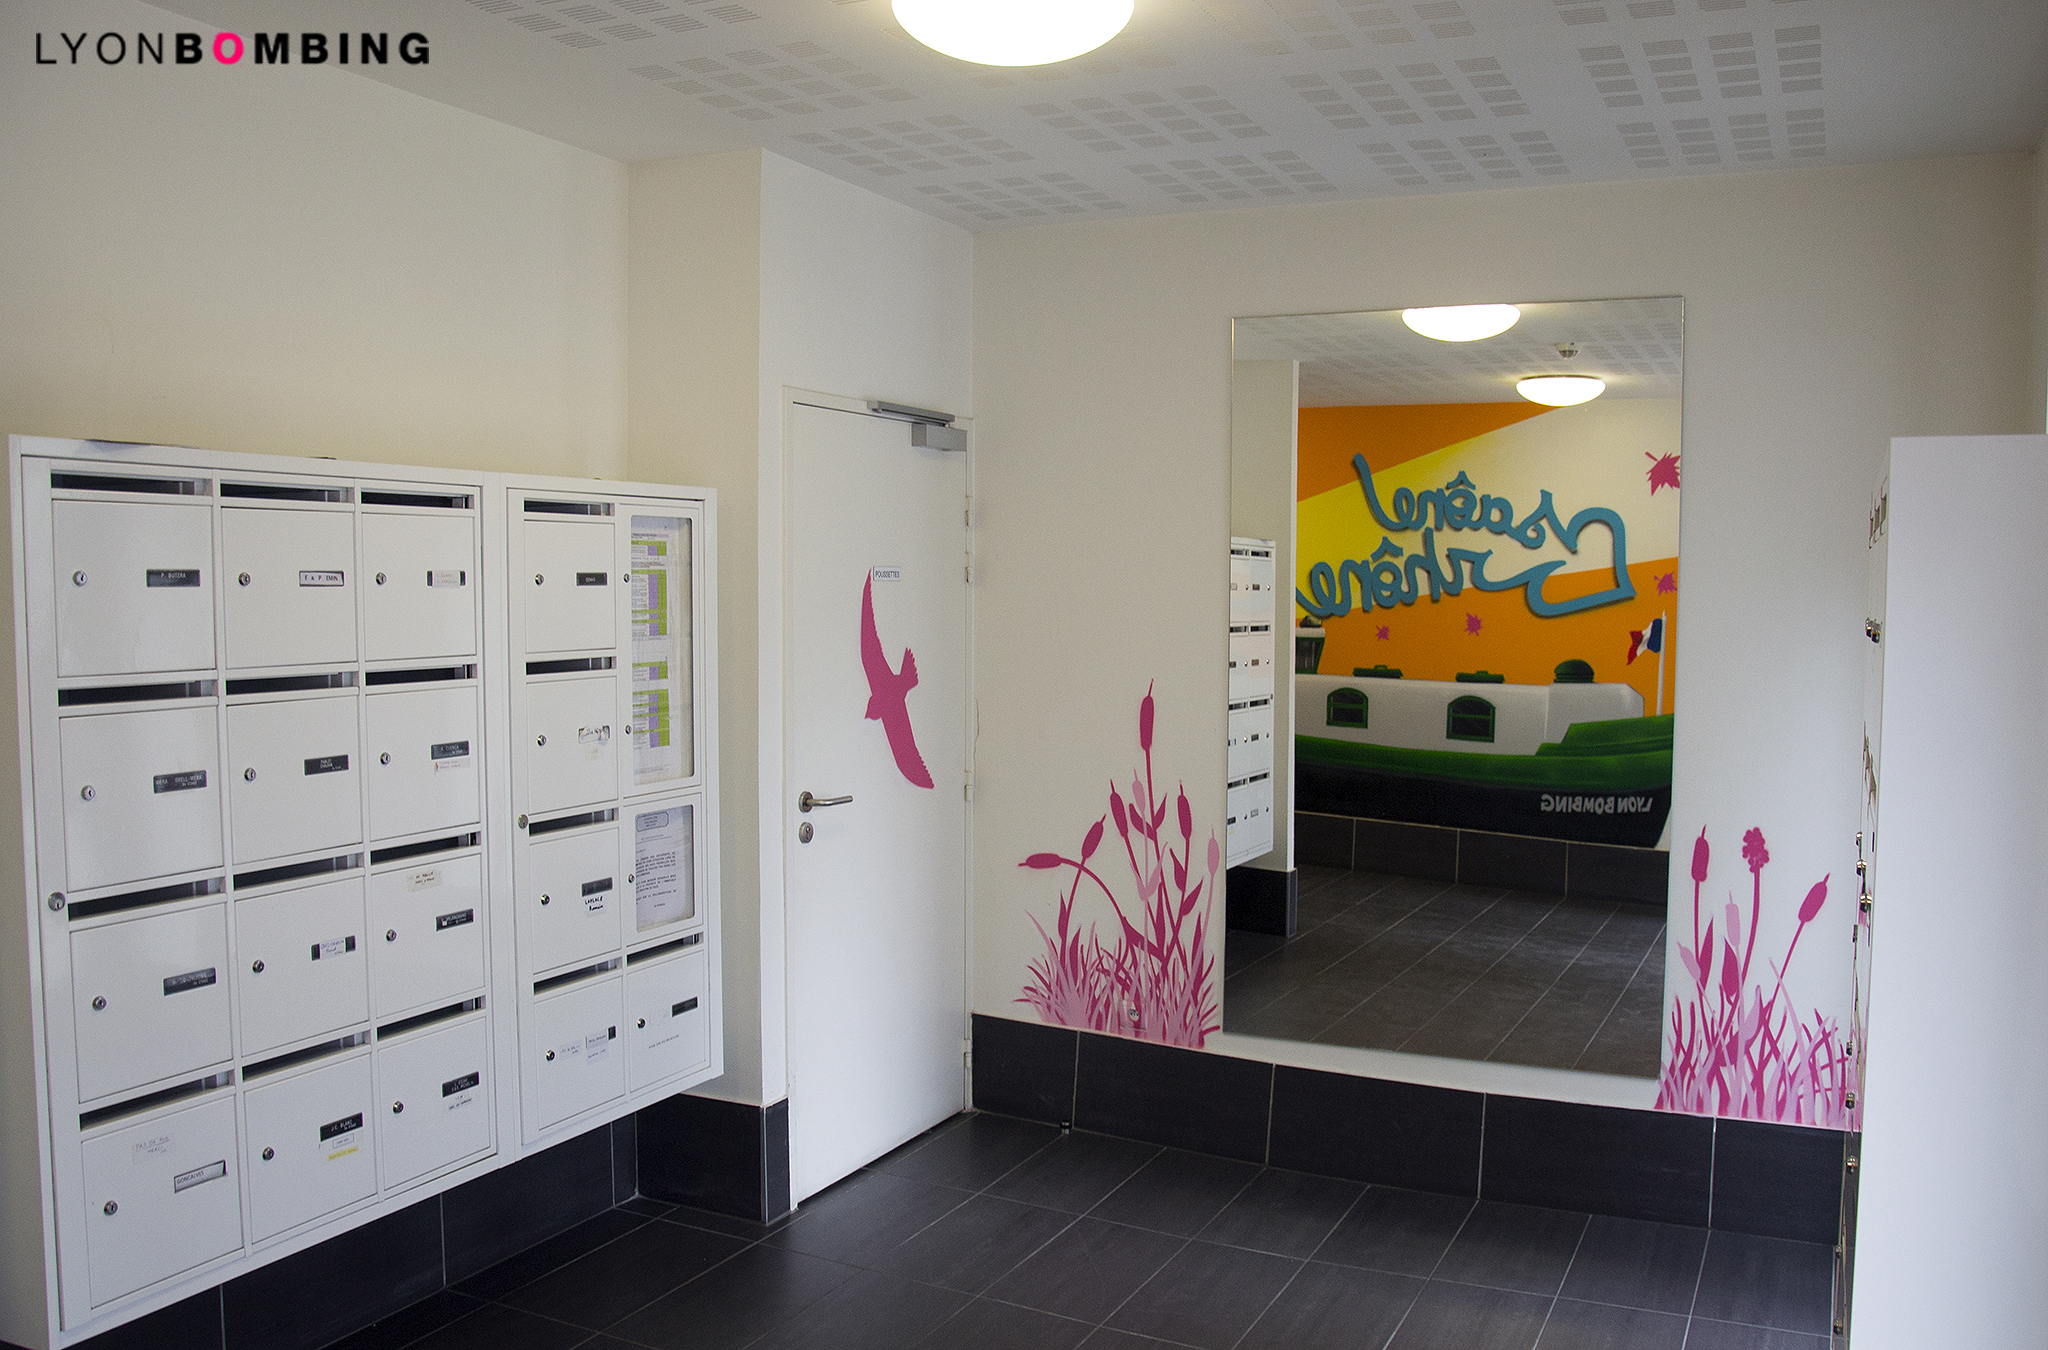 decoration-graffiti-fresque-murale-allee-d-immeuble